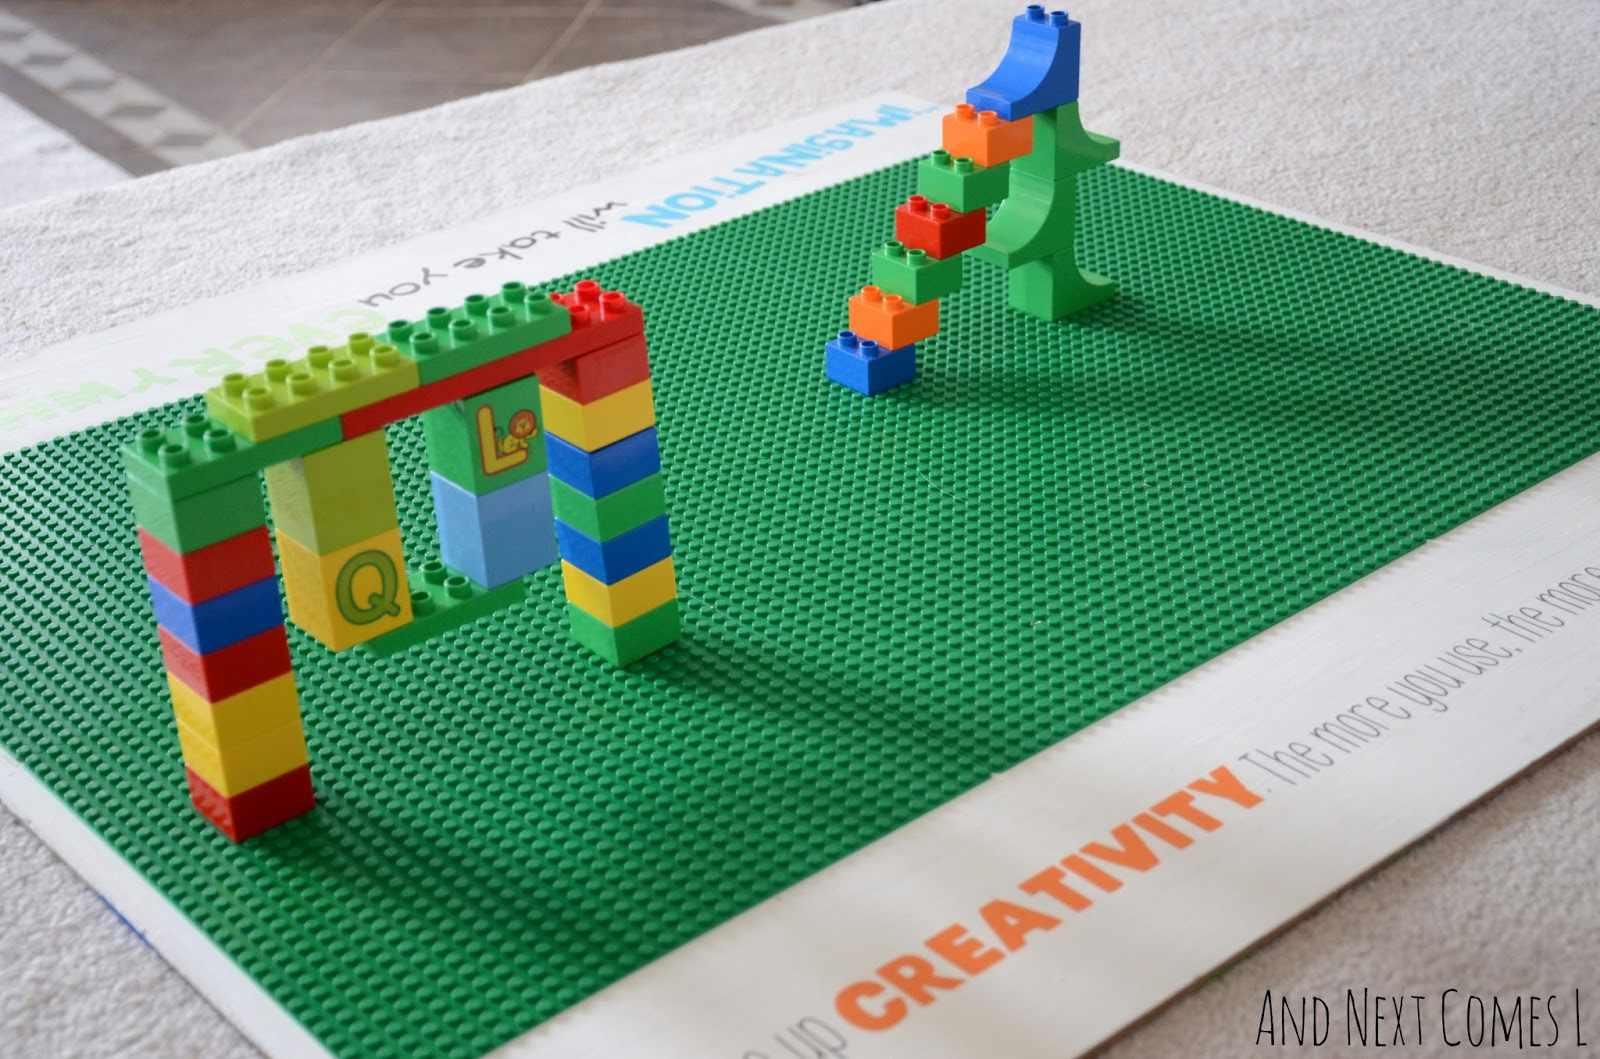 A LEGO board on the floor